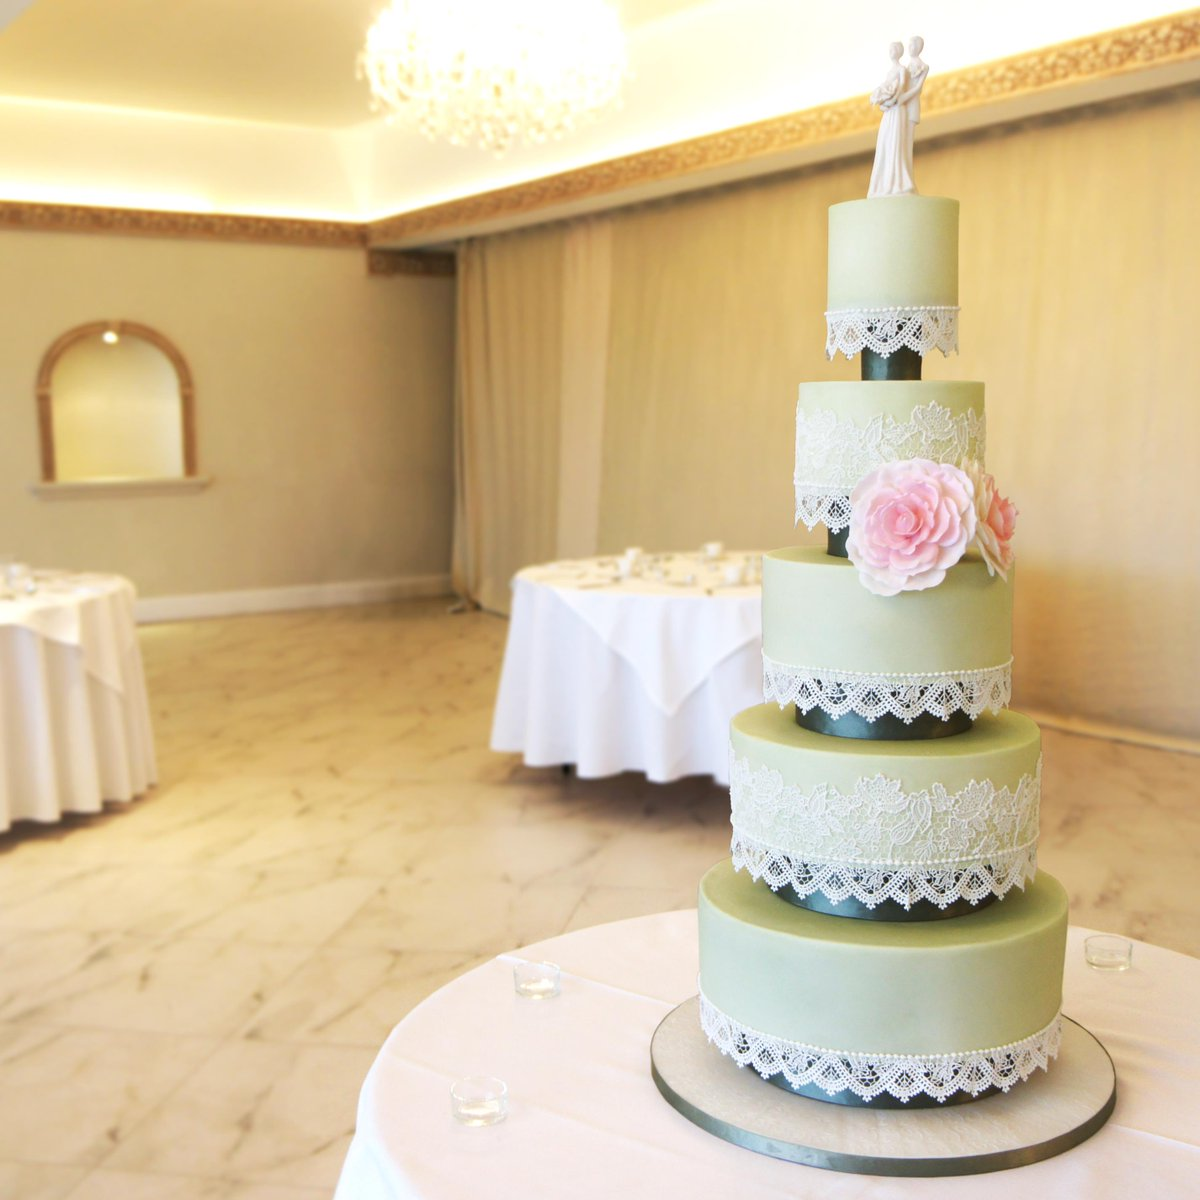 Cake & Lace Weddings on Twitter: \